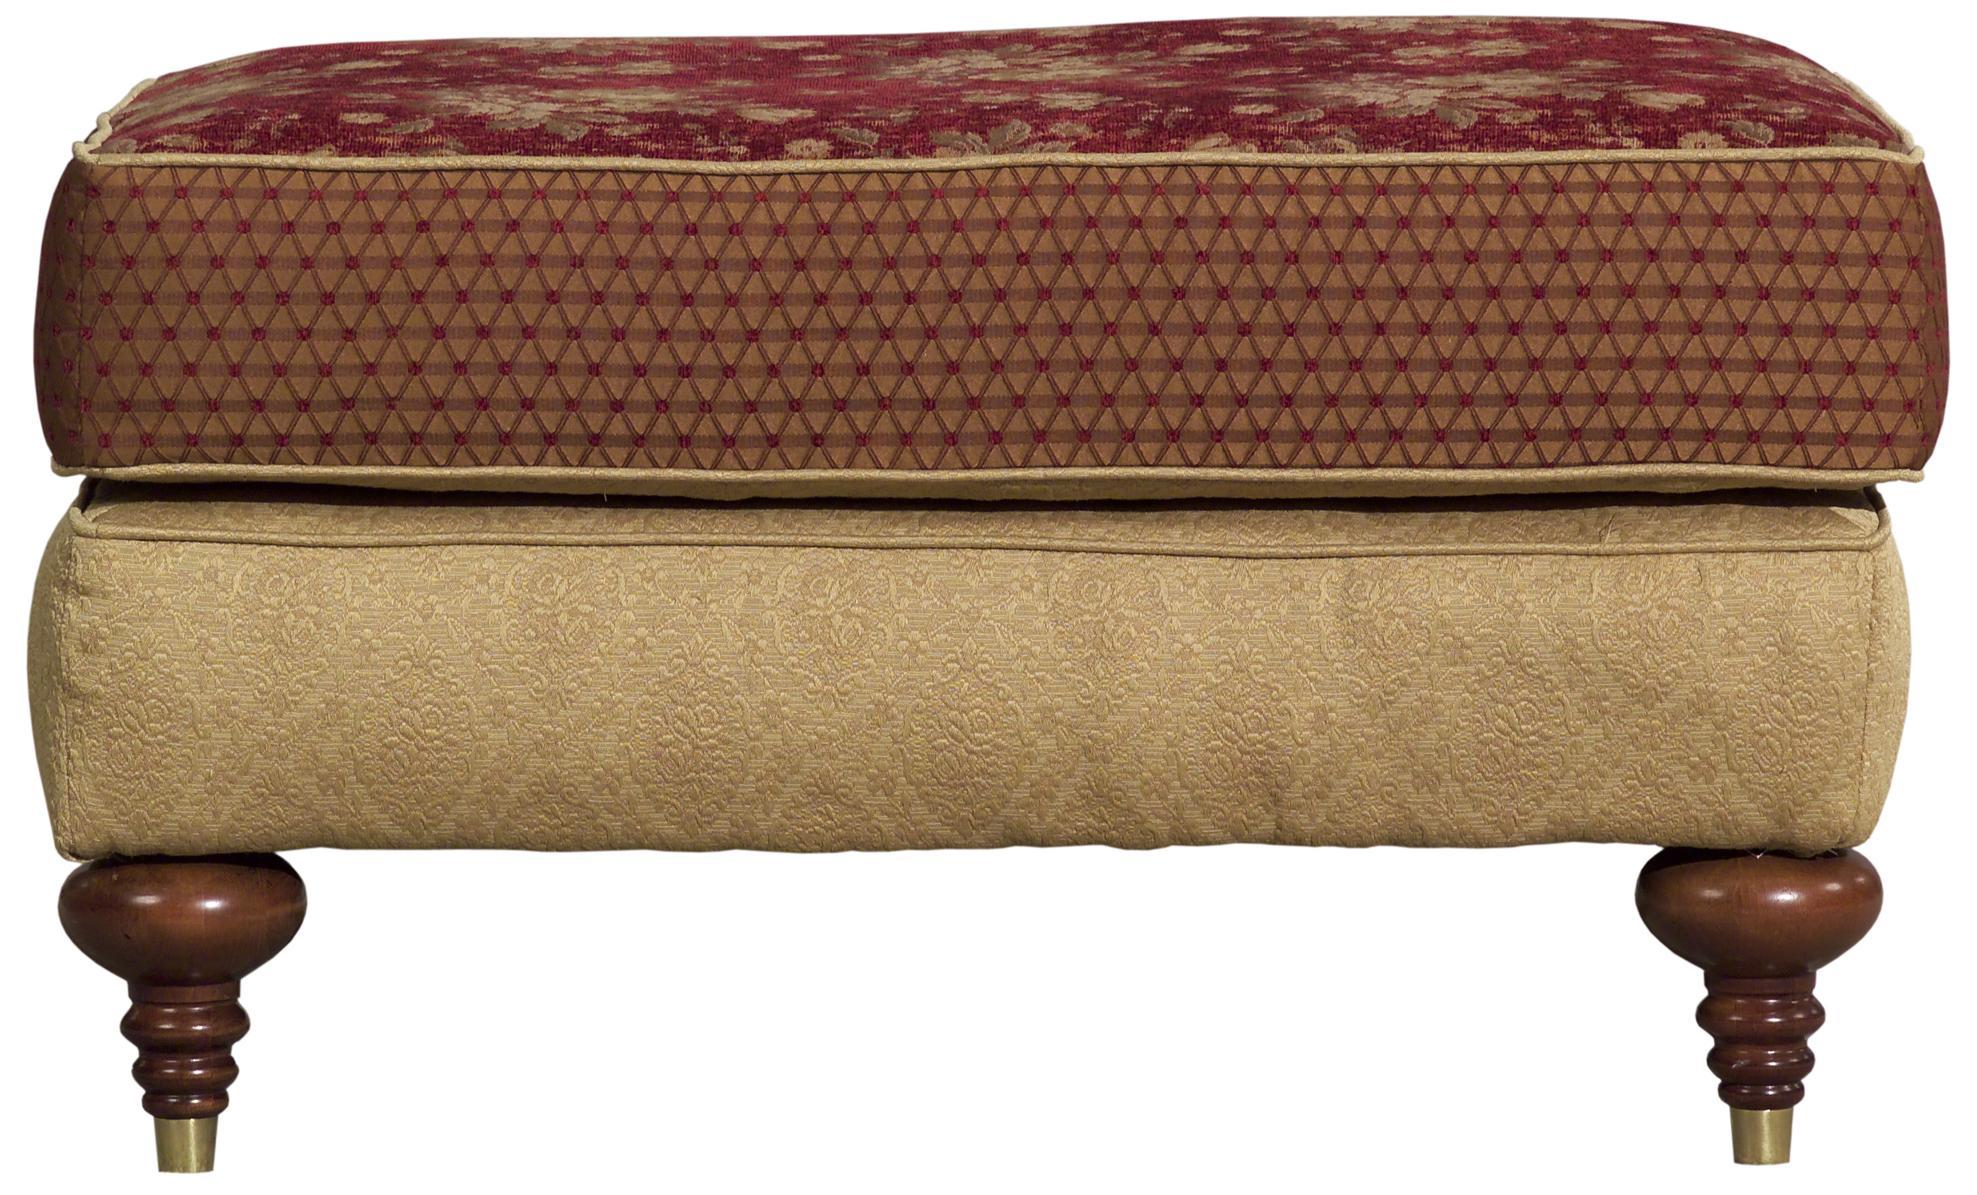 Tuscany Ottoman by Kincaid Furniture at Johnny Janosik